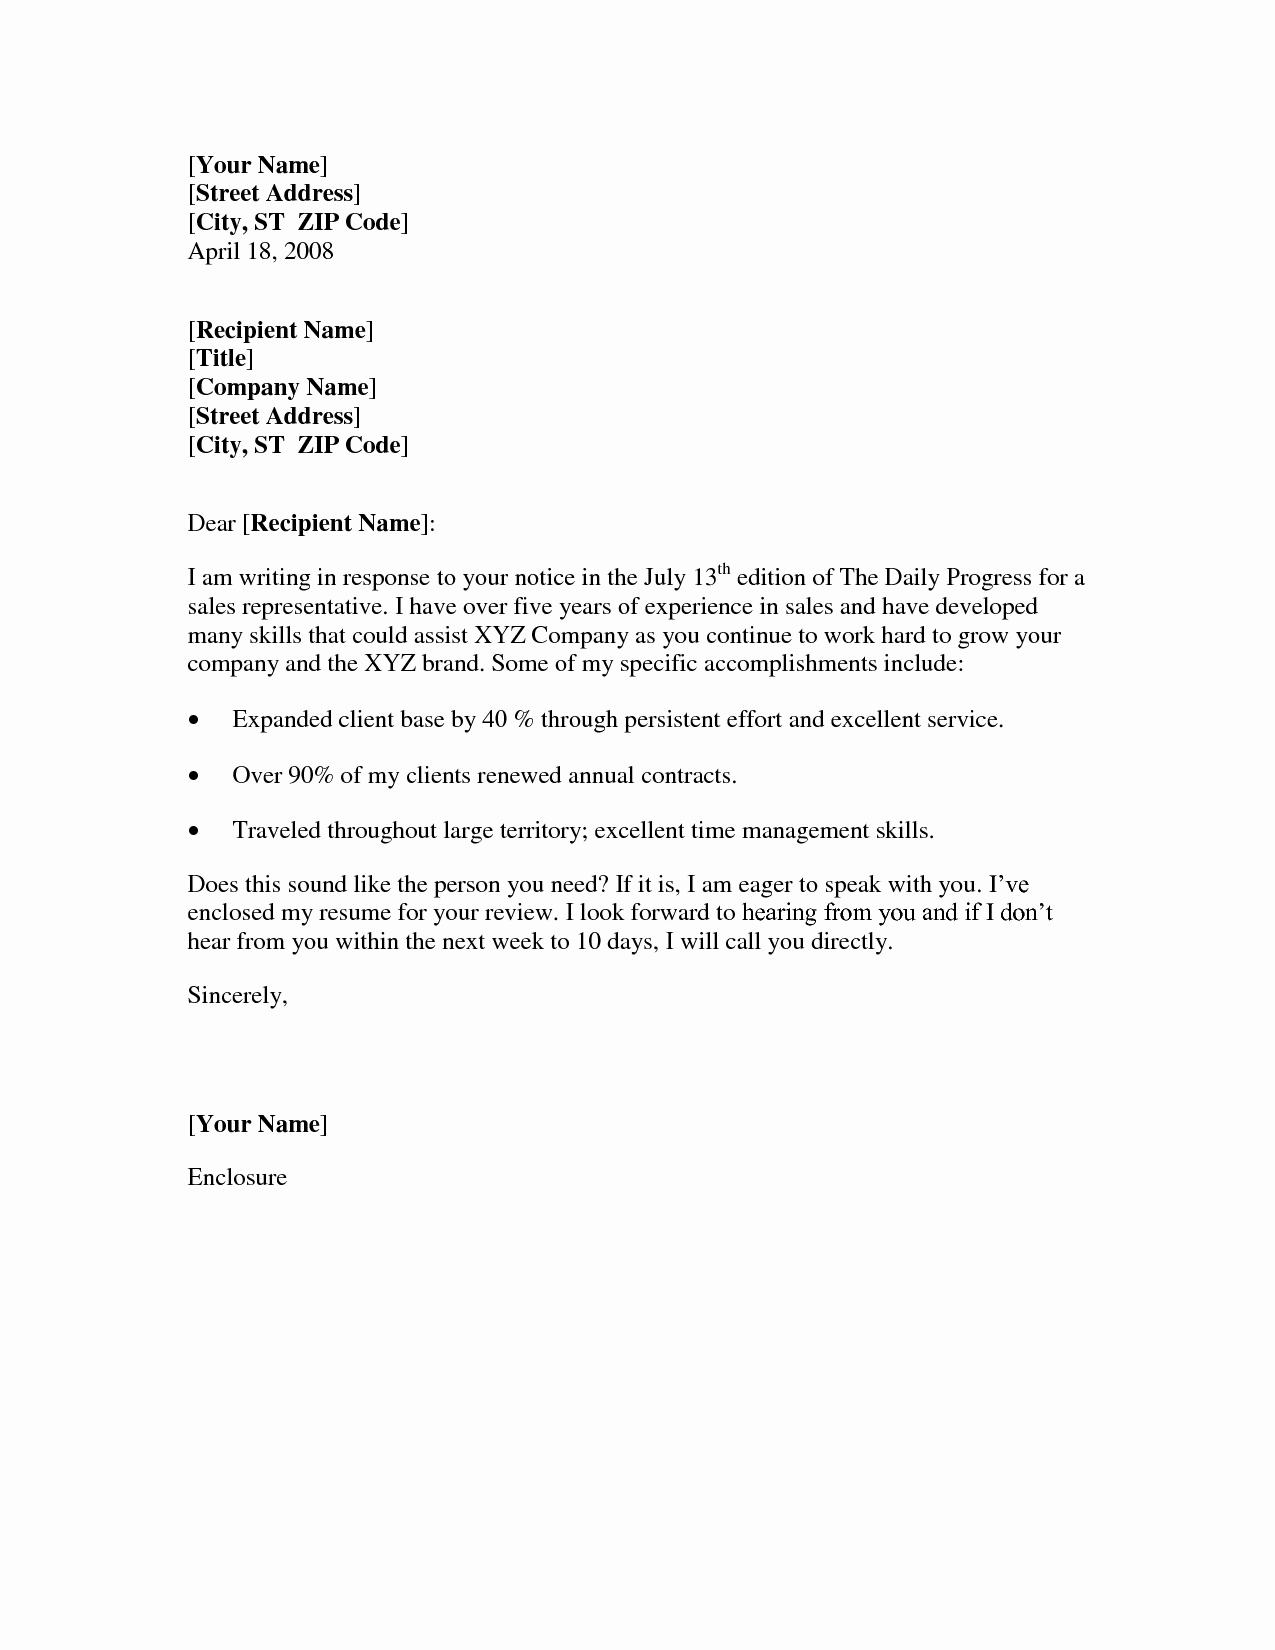 Resume and Cover Letter formats Luxury 10 Best Of Basic Cover Letter for Resume Sample